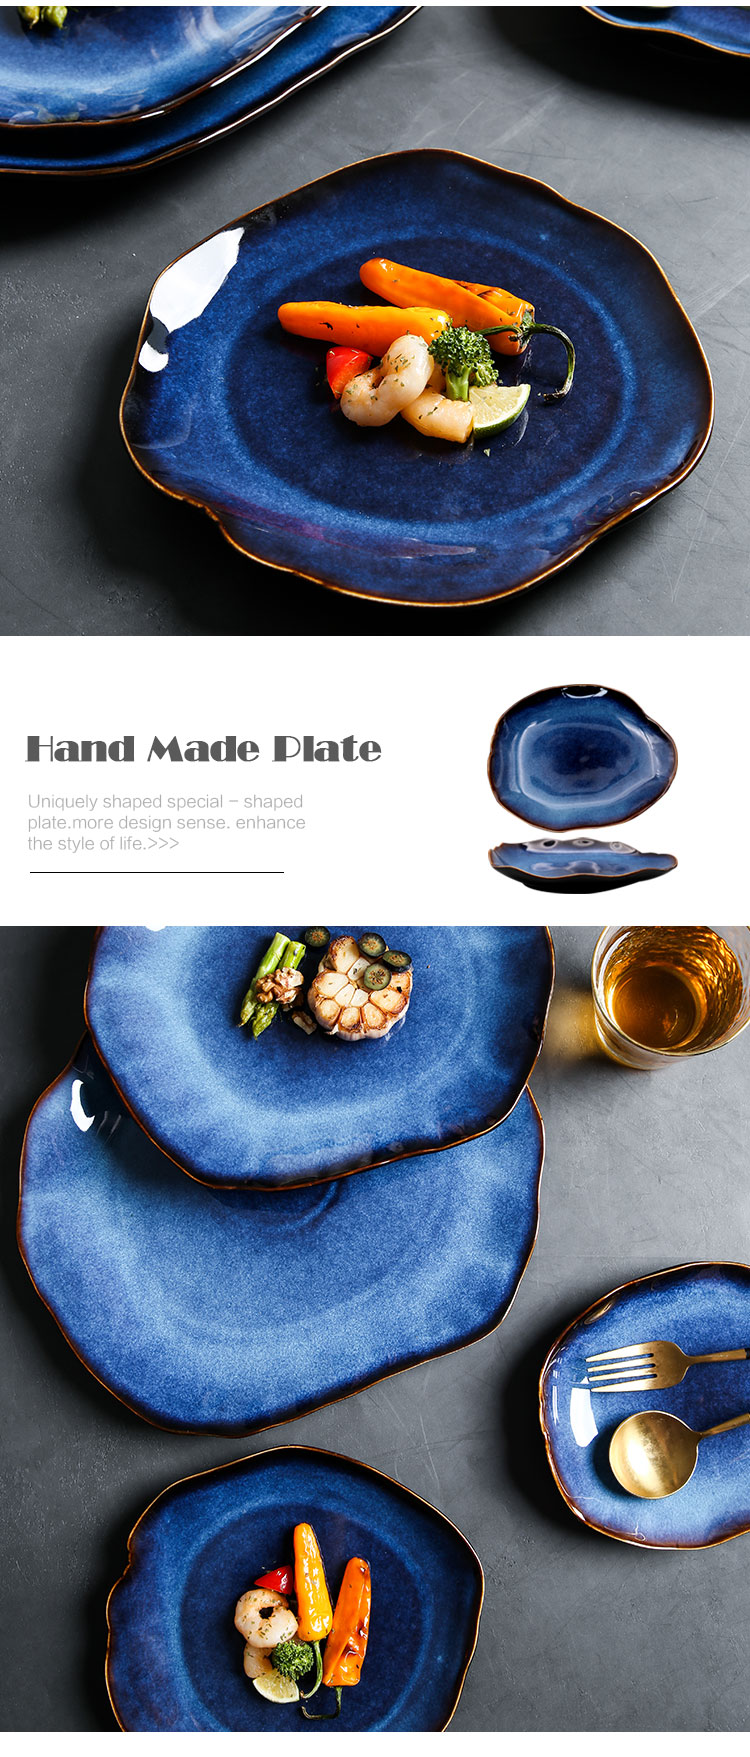 KINGLANG NEW Japanese Ceramic Food Dish Flat Plate Pottery Irregular Dish Dinnerware Dropshipping Wholesale Dishes